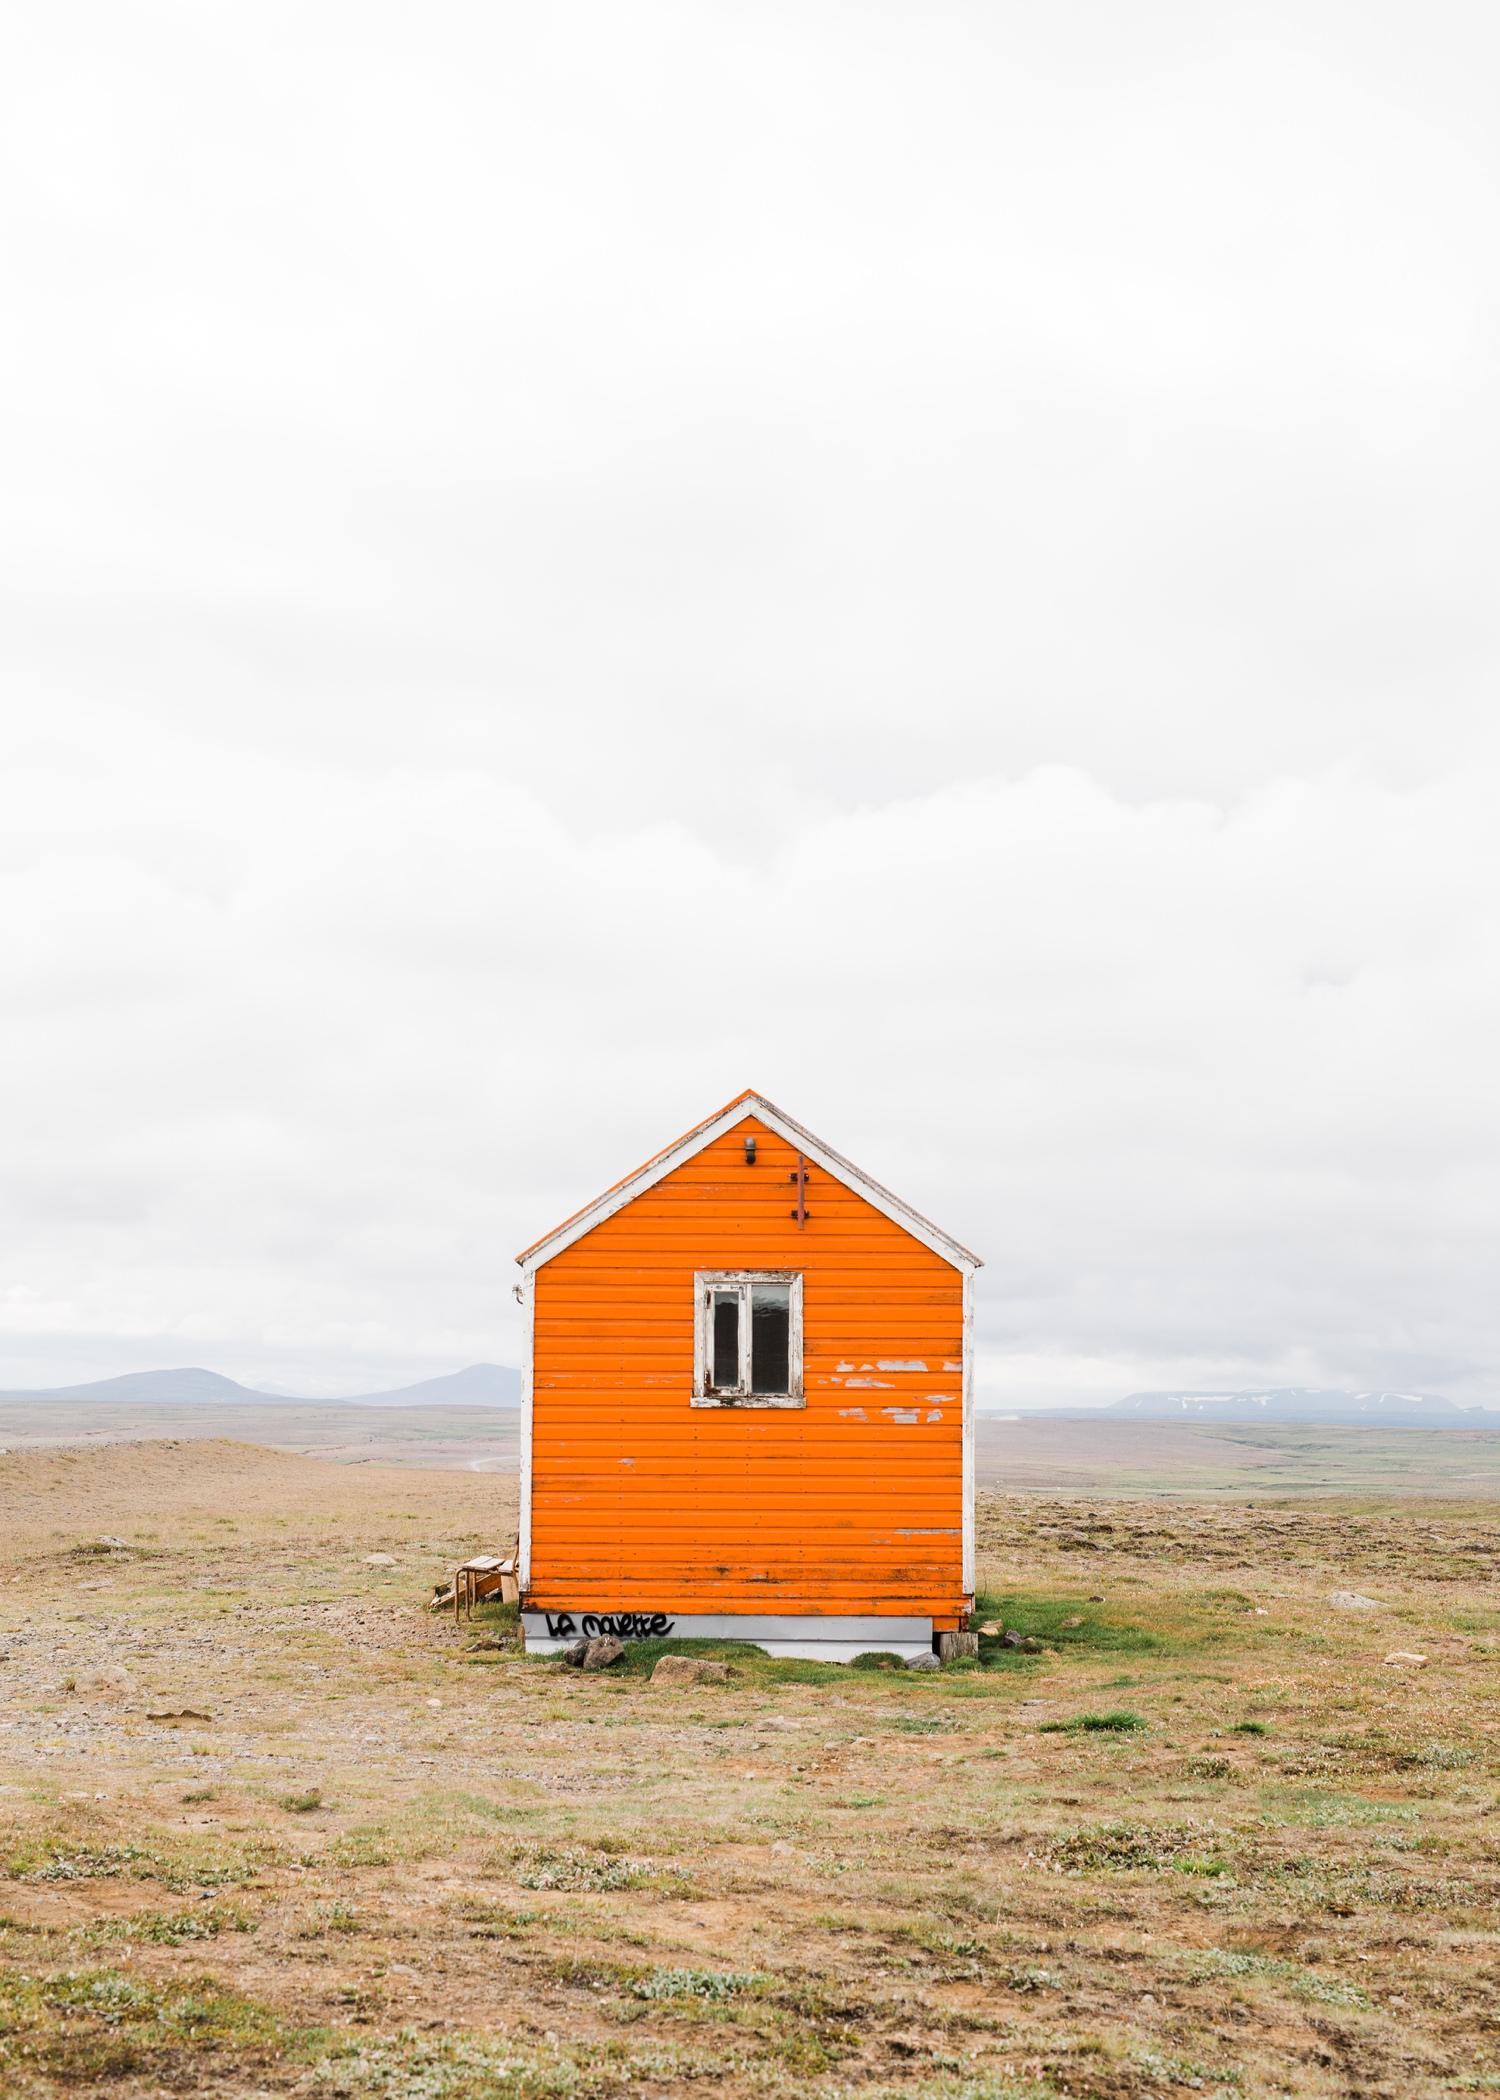 cameron-zegers-travel-photographer-seattle-iceland-road-trip.jpg